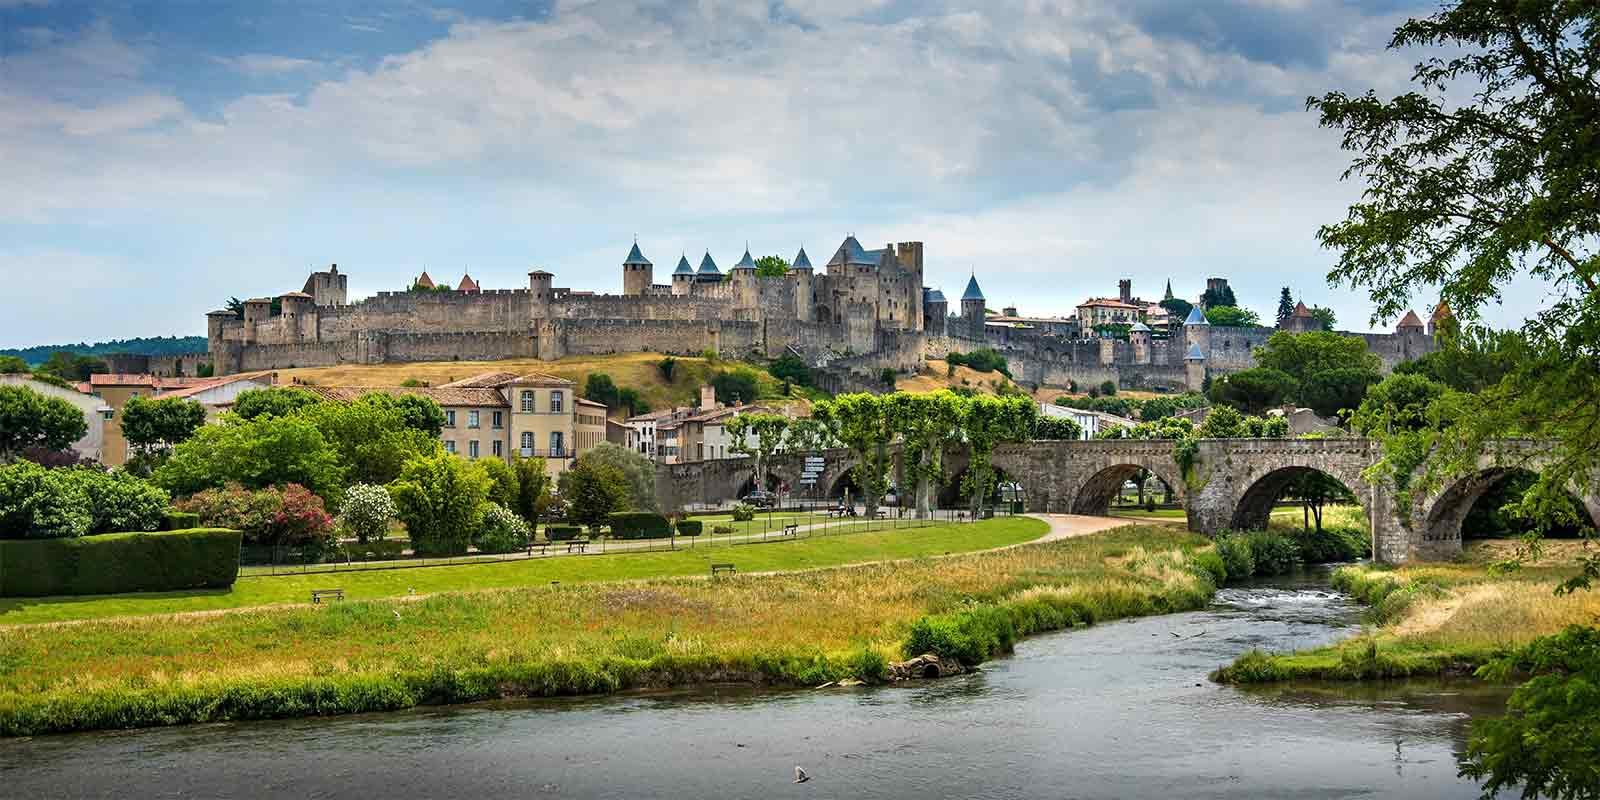 Carcassonne Castle overlooking the River Aude